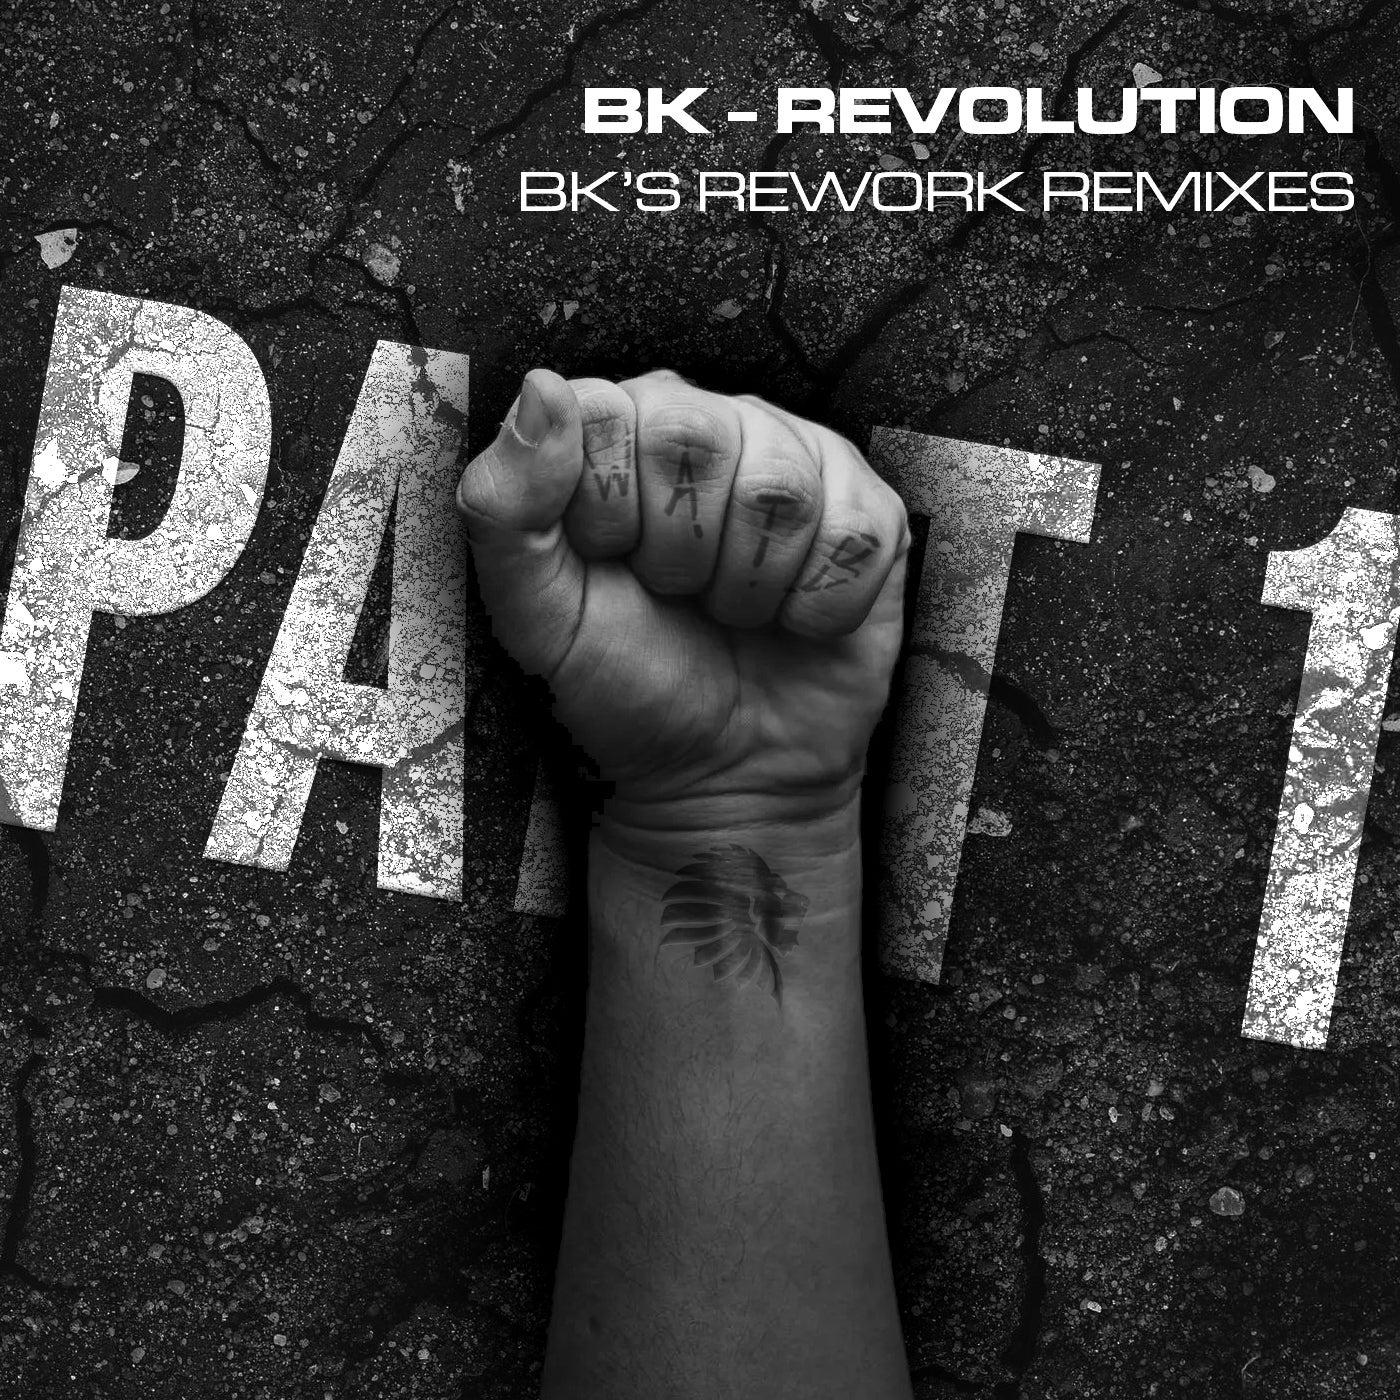 Revolution - BK's Rework (Reinier Zonneveld Remix)